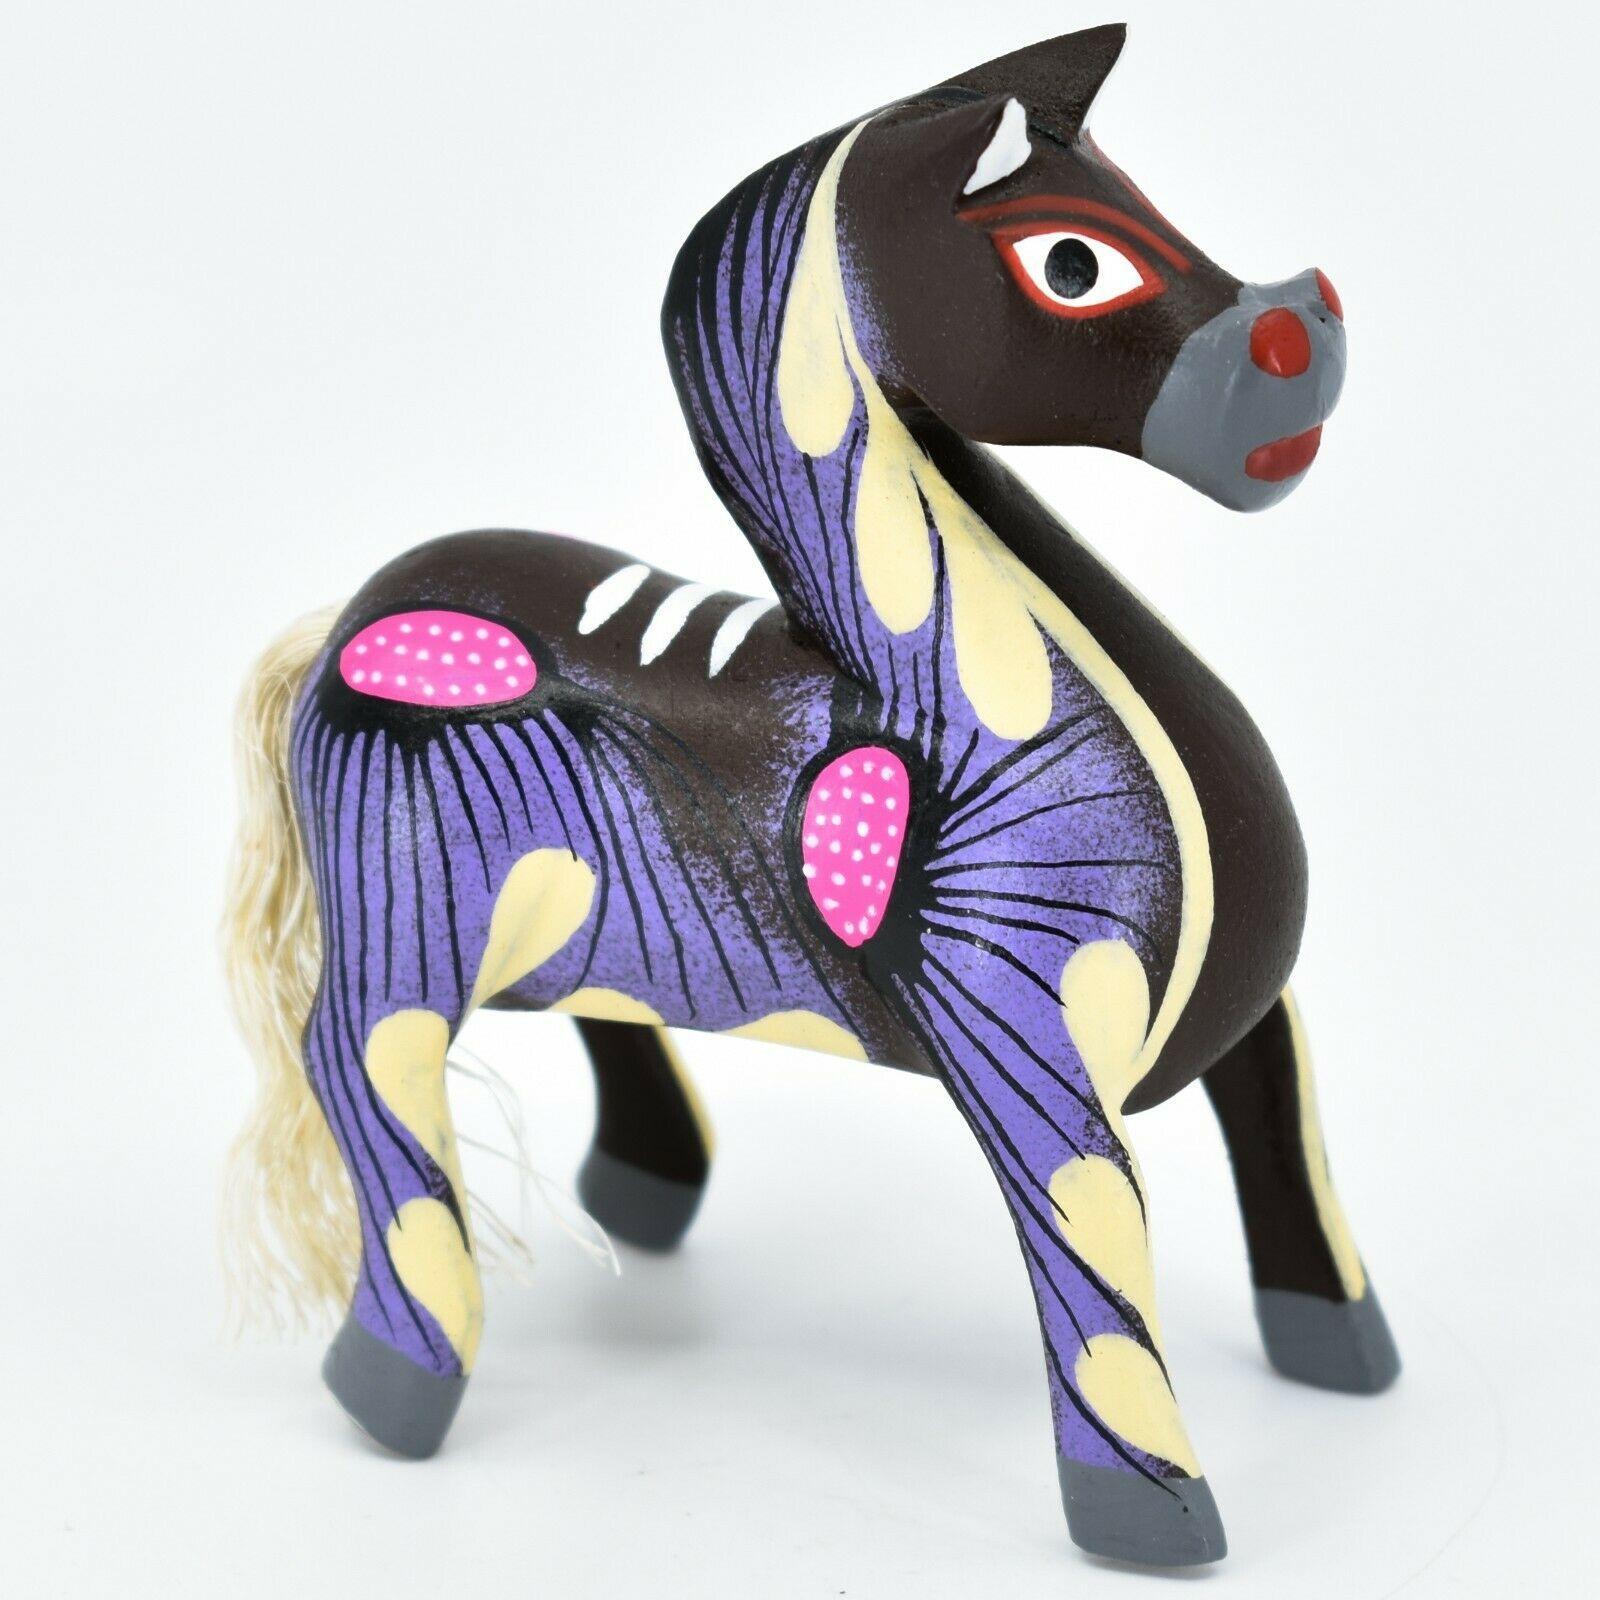 Handmade Alebrijes Oaxacan Copal Wood Carving Painted Folk Art Horse Figurine